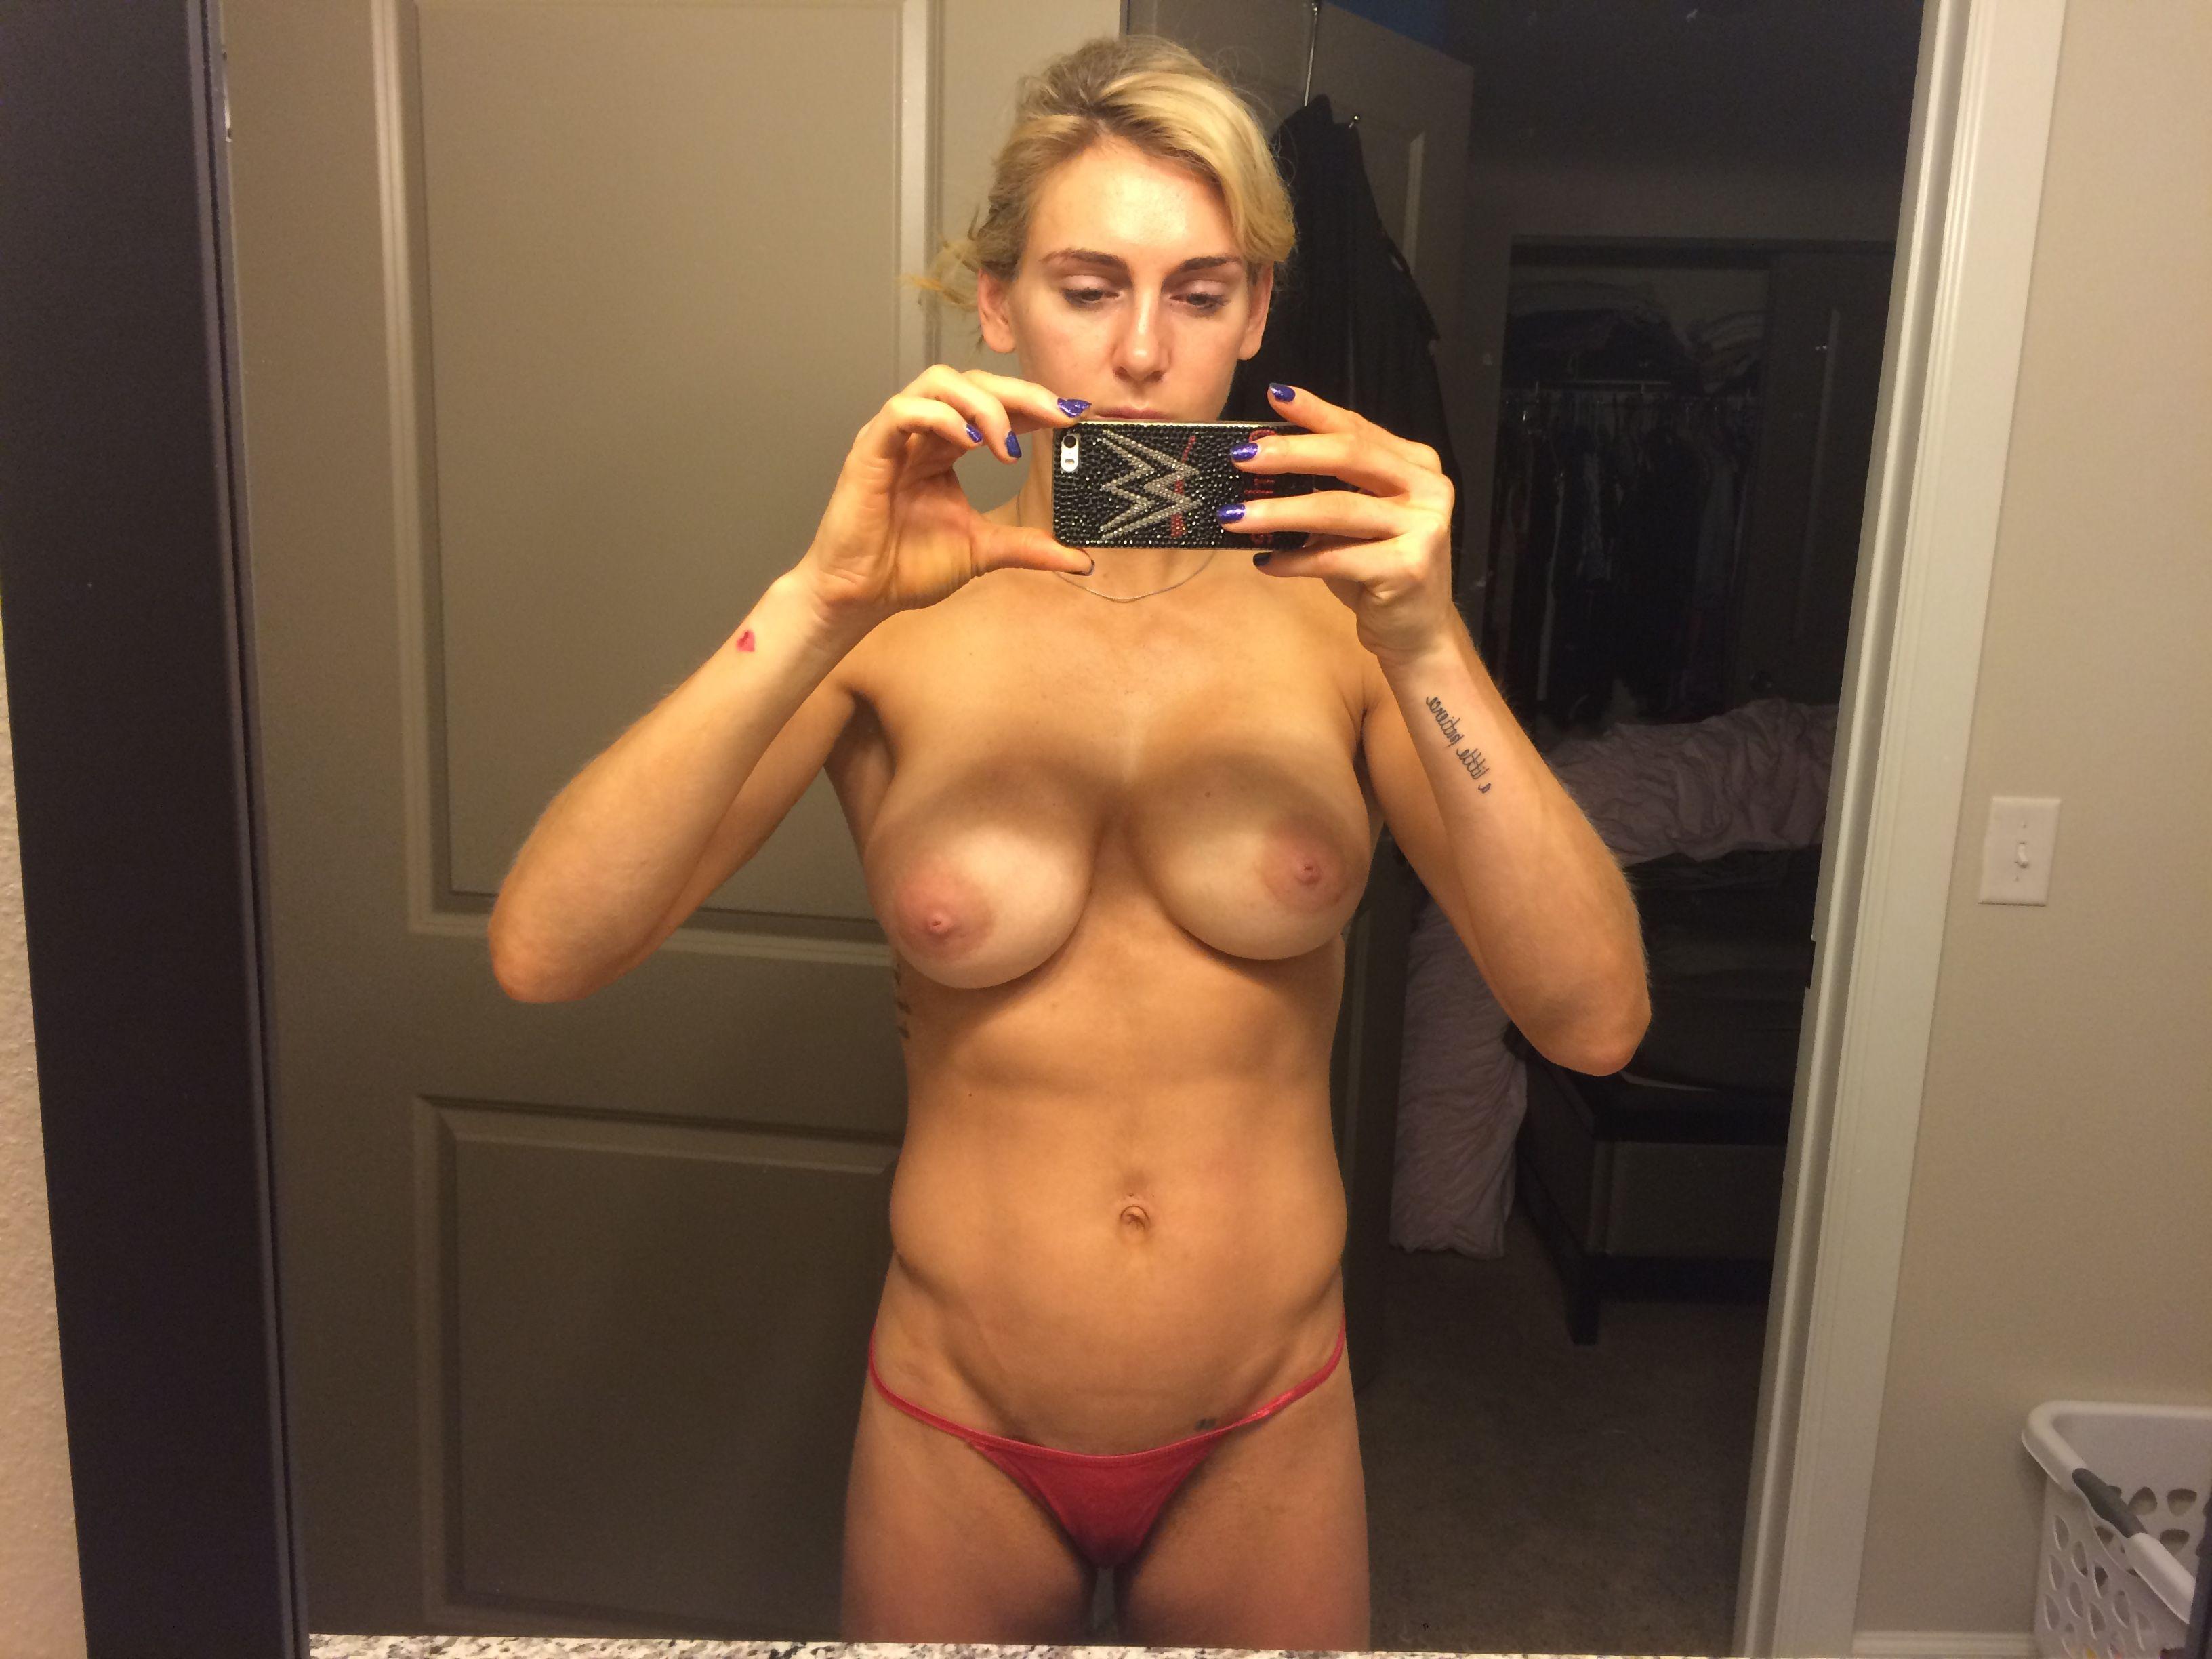 pics of boobs Nudes